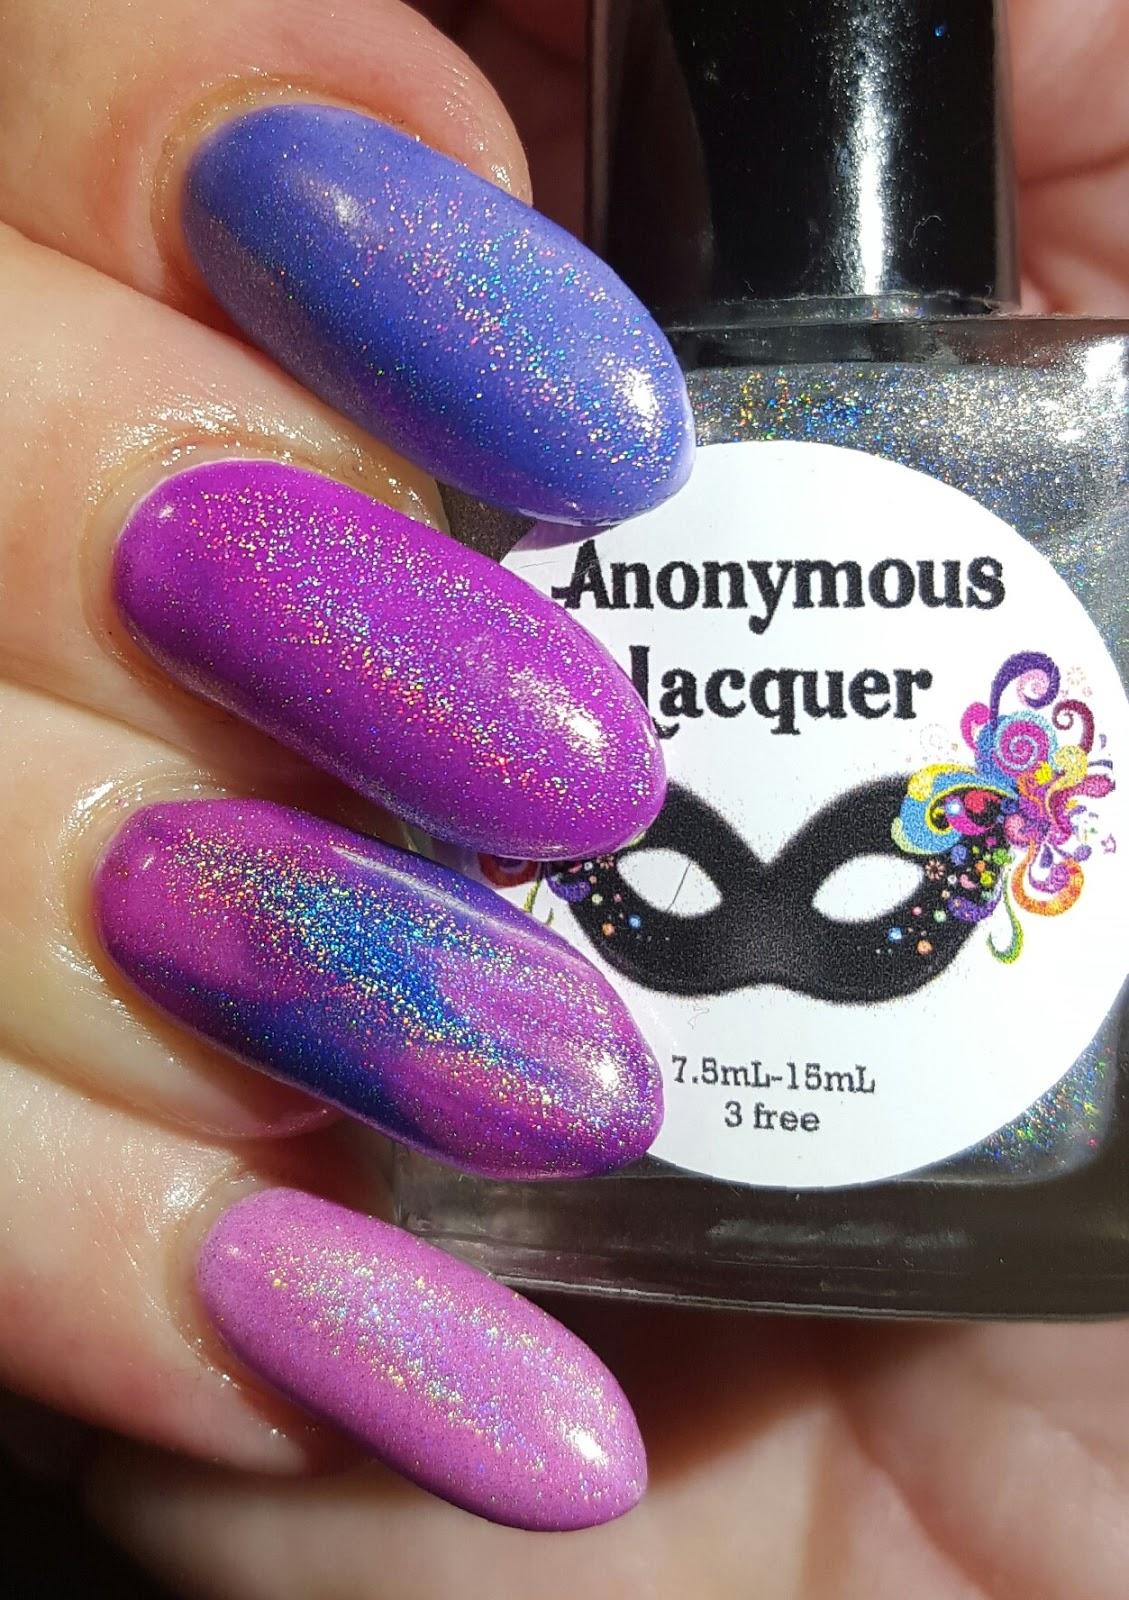 Inky Whisker's Musings: 40 Great Nail Art Ideas